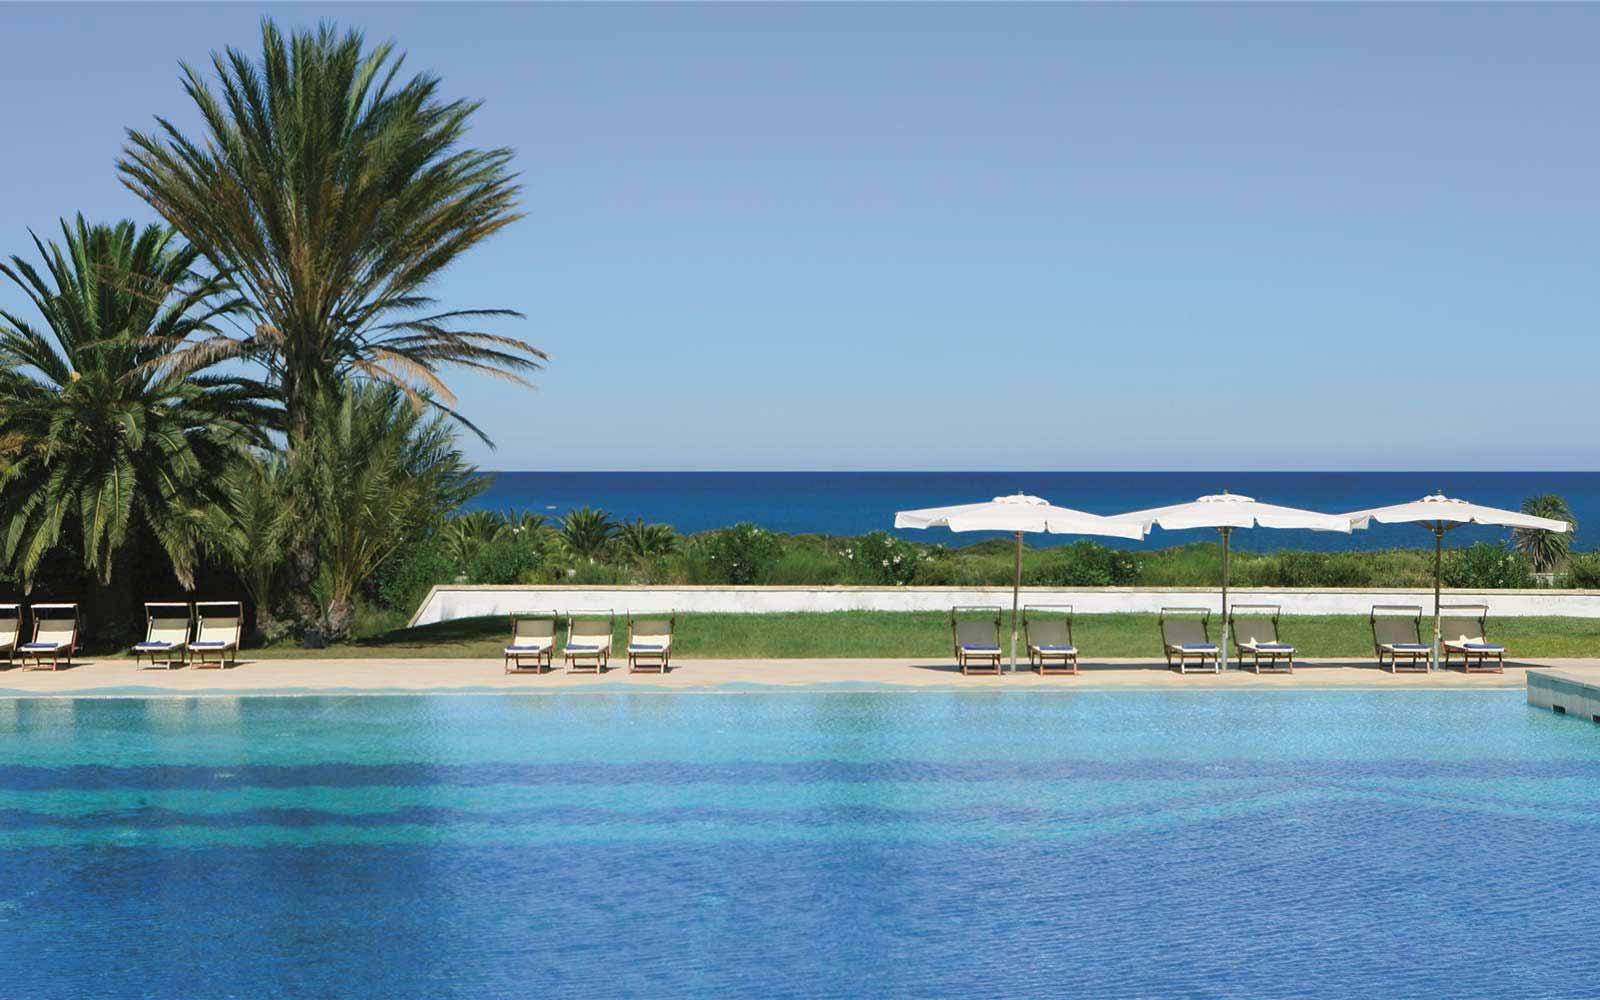 The swimming pool at the Grand Hotel Masseria Santa Lucia